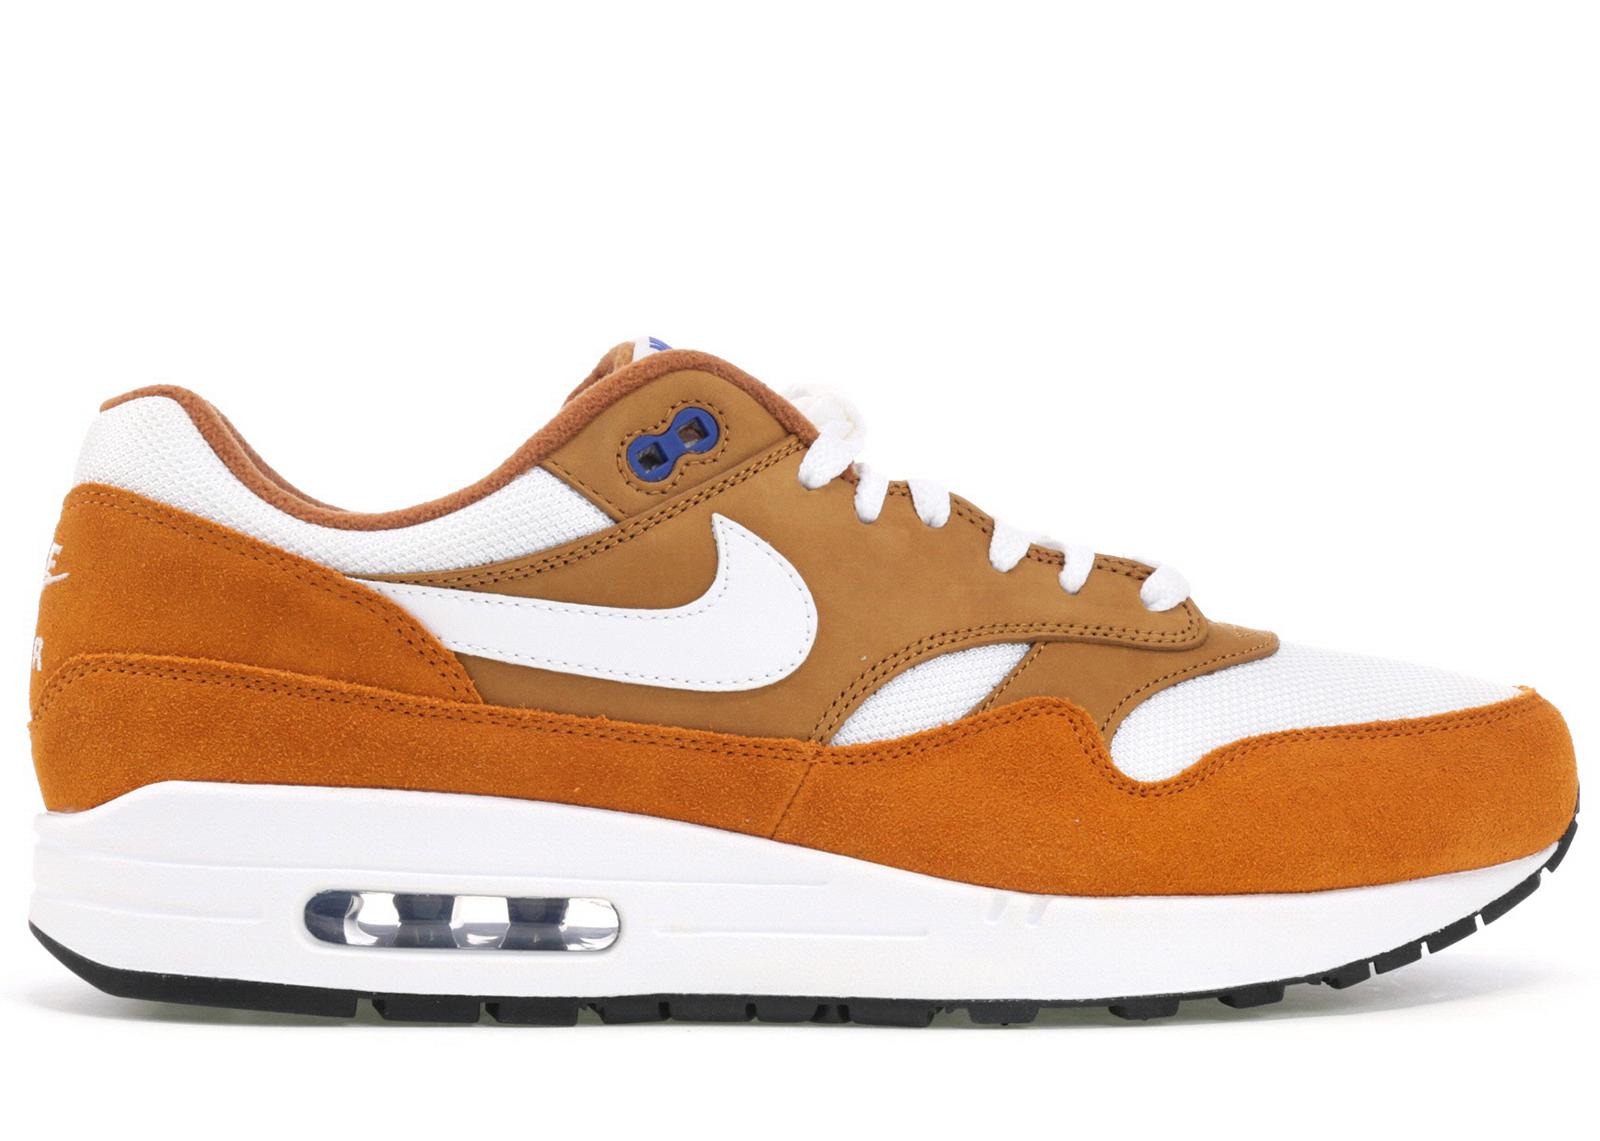 Buy Nike Air Max 1 Shoes & Deadstock Sneakers